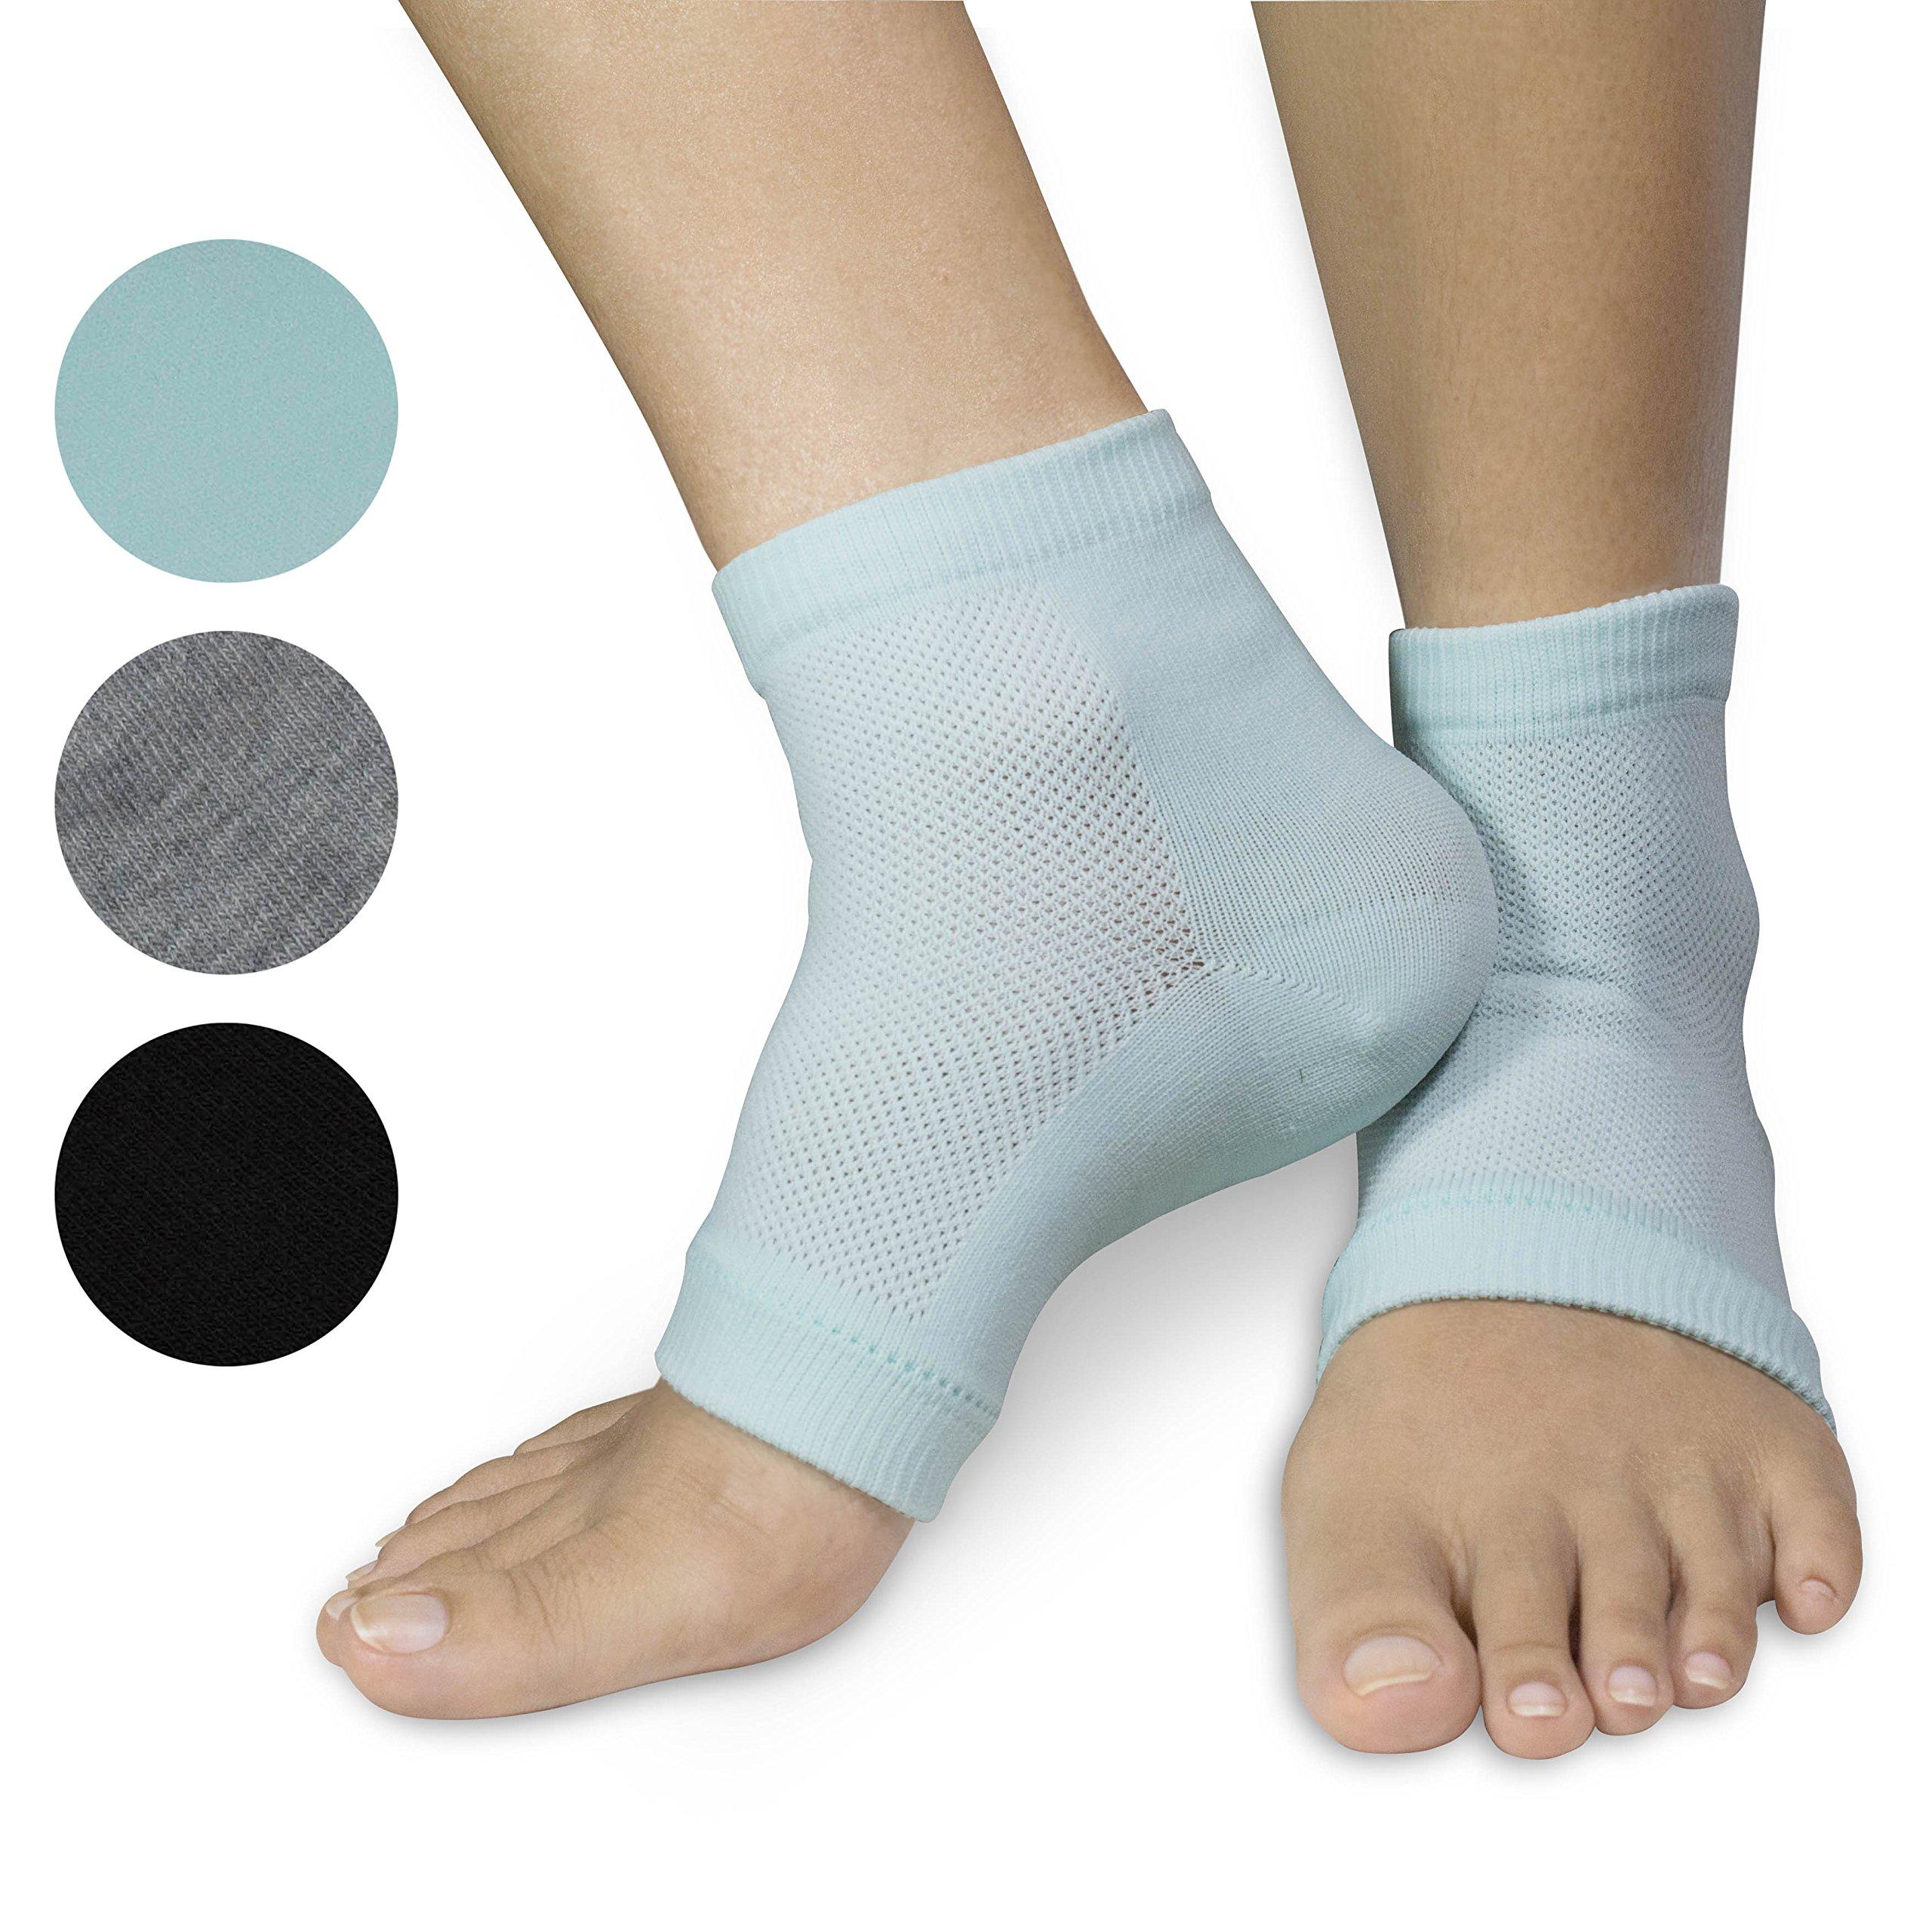 3 PAIRS-Moisturizing Gel Heel Socks w/ Enriched Vitamins for Dry Hard Cracked Heels & DIY Simple Home Remedies by Triim Fitness by Triim Fitness (Image #3)